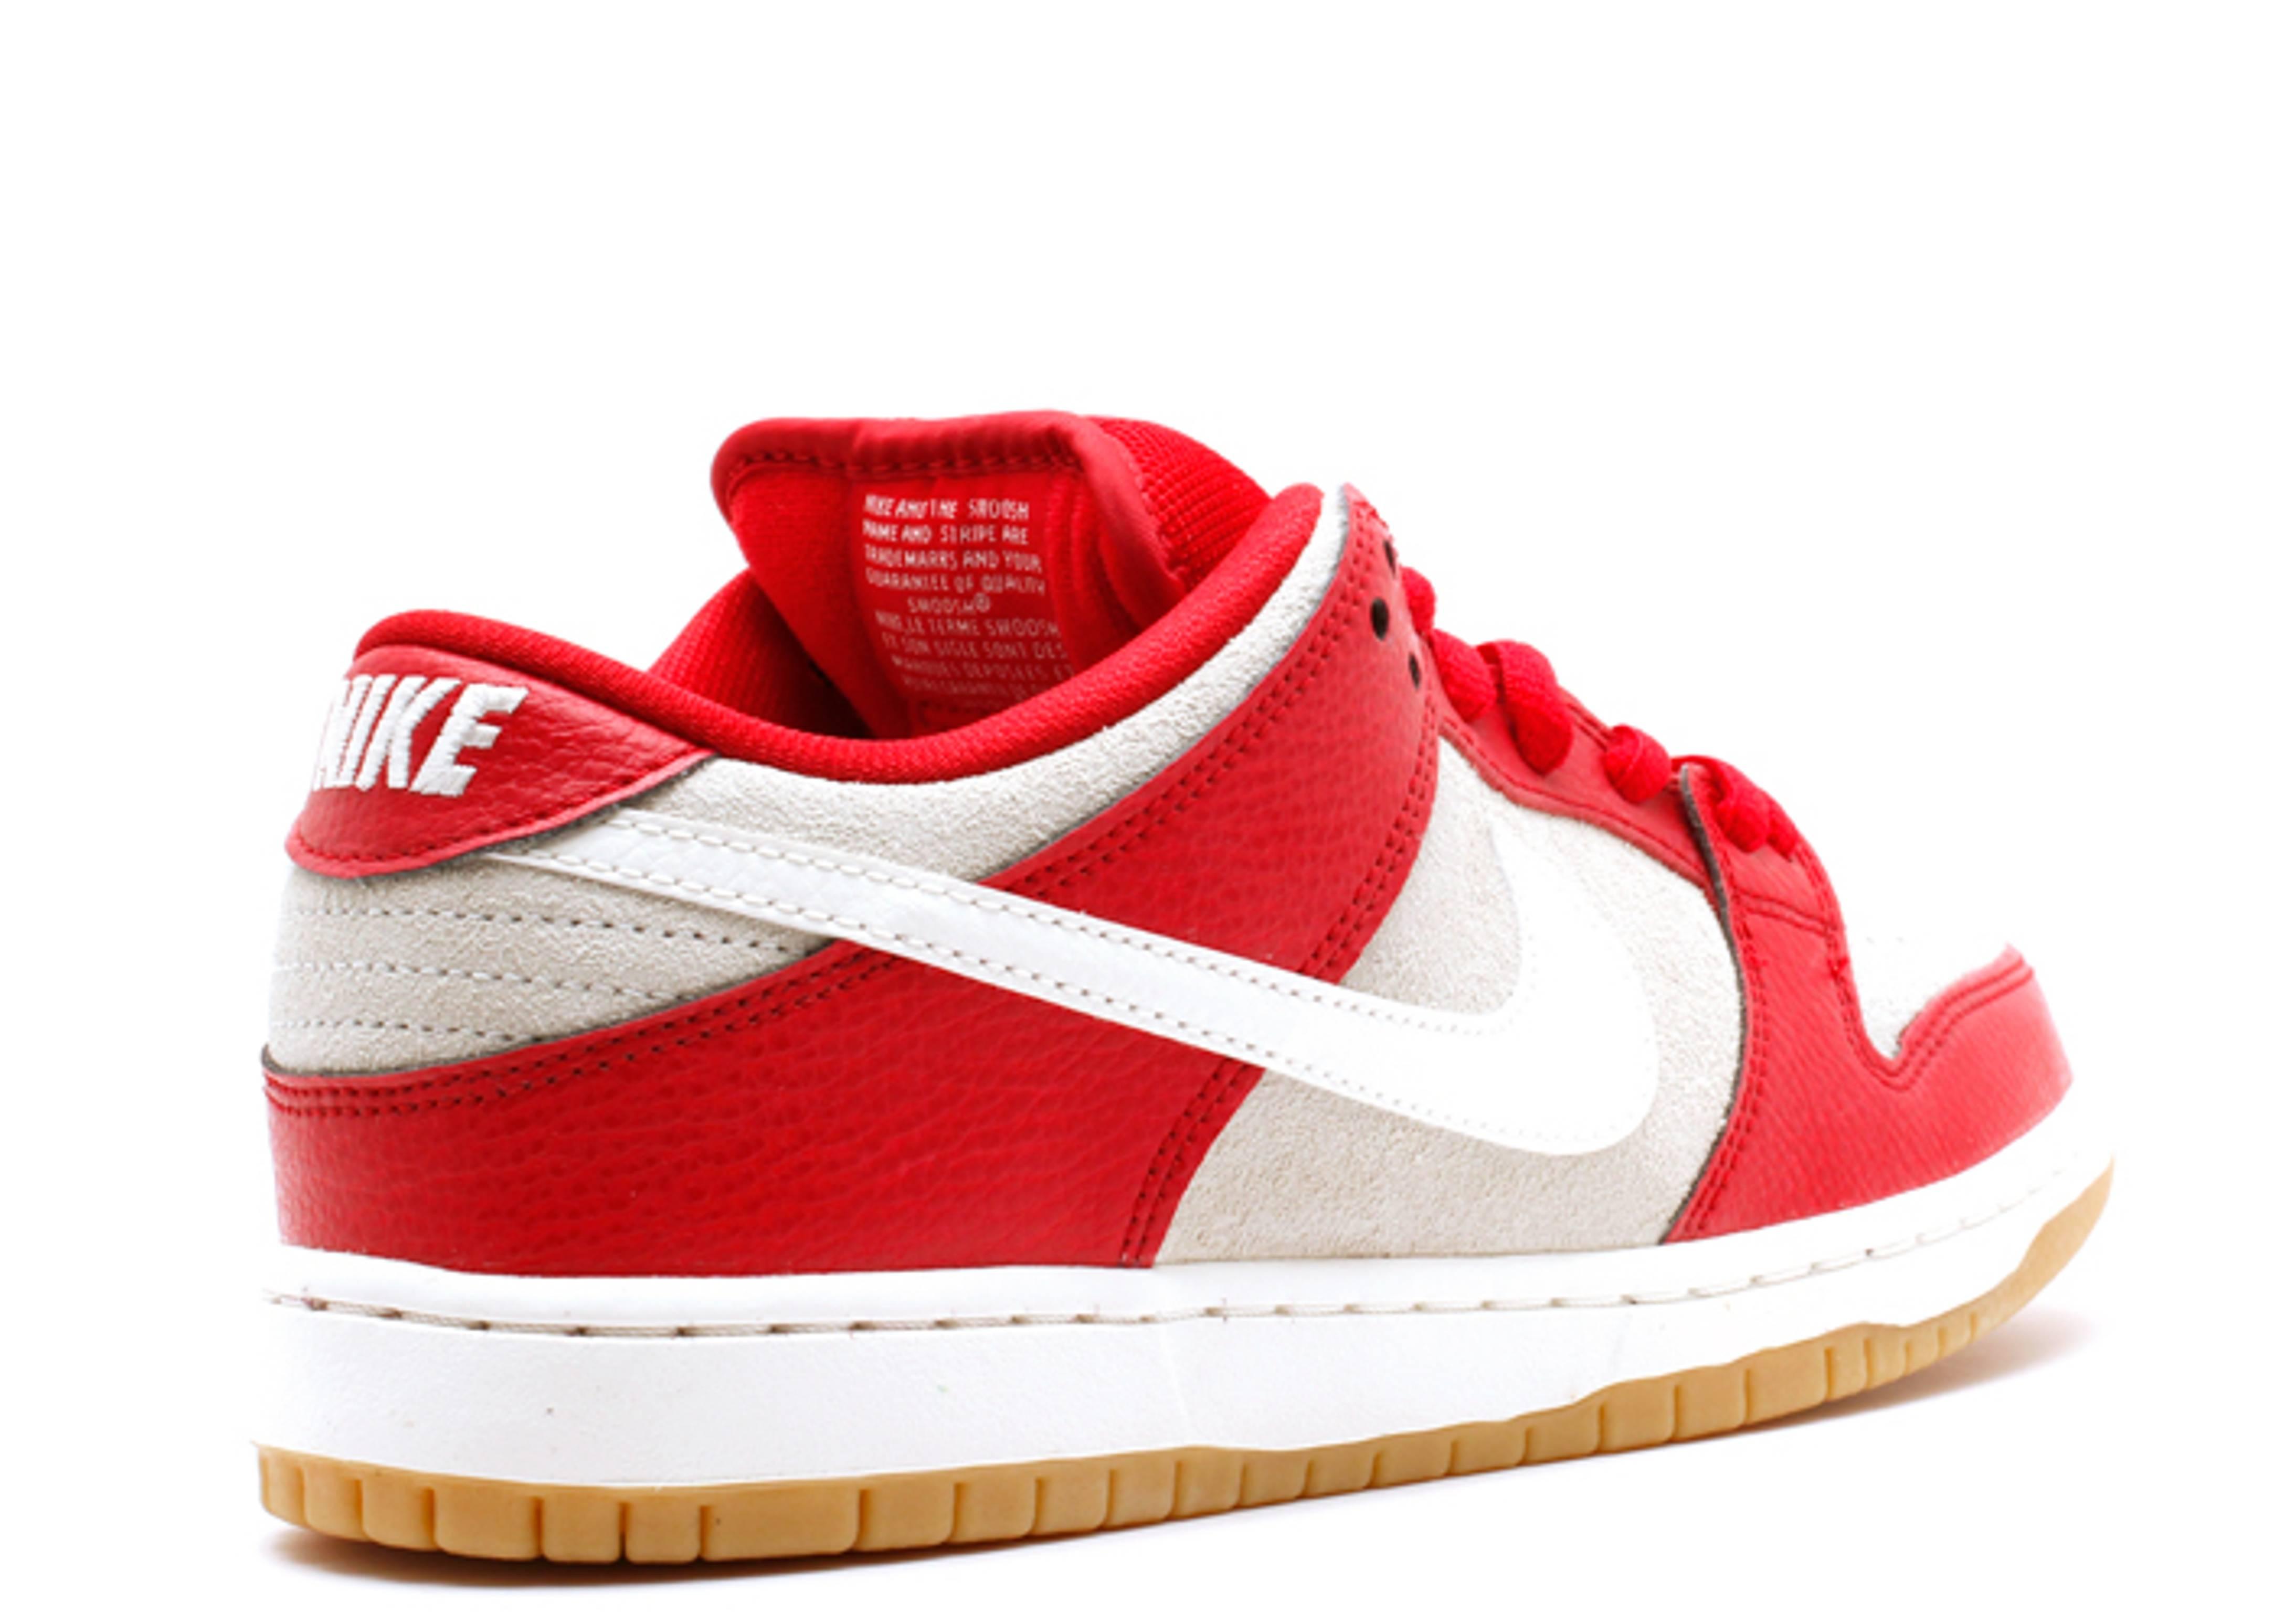 Nike Dunk Sb Valentines Day